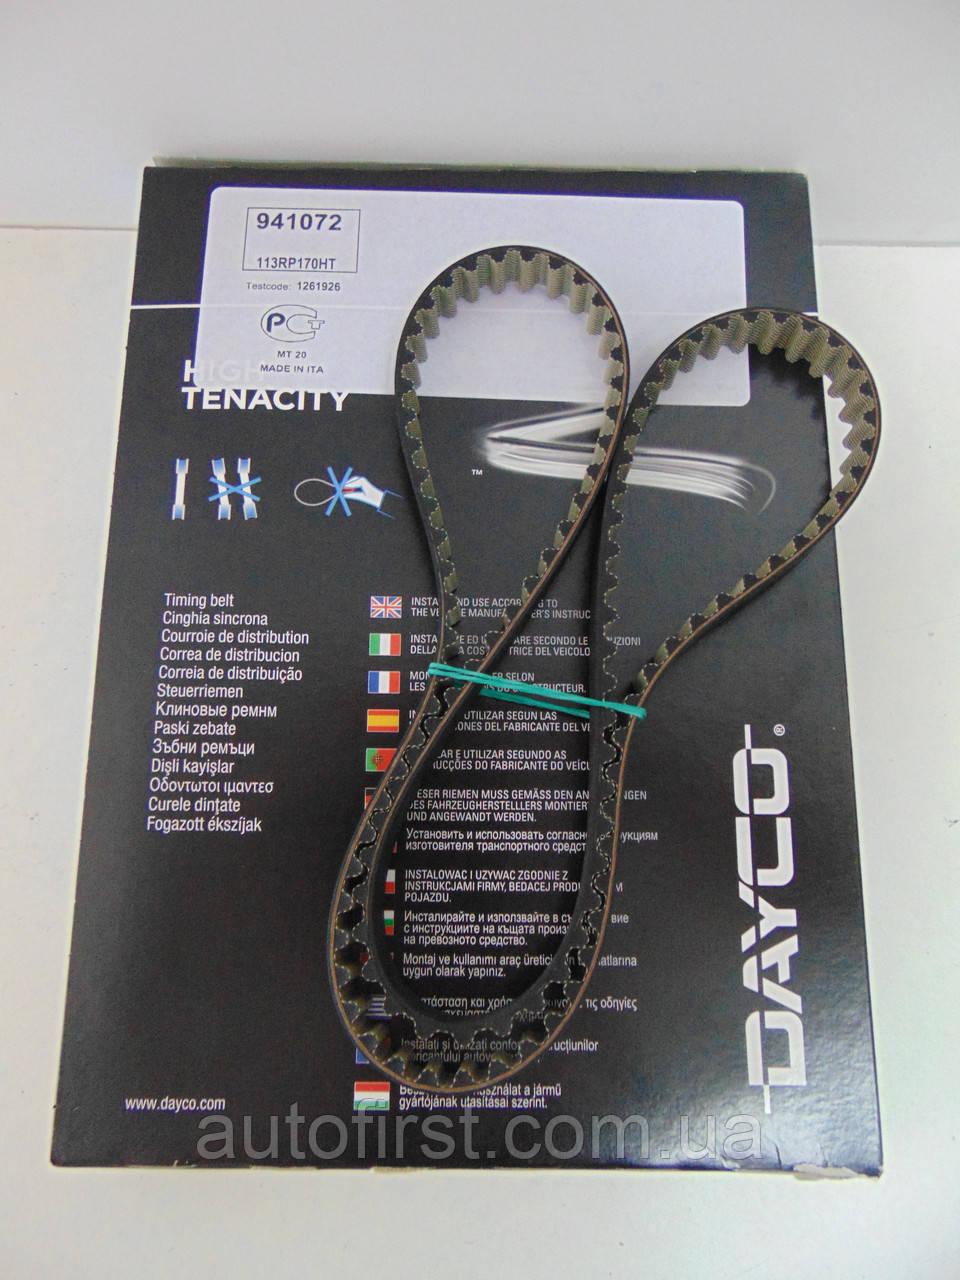 Dayco 941072 Ремень ГРМ ВАЗ 2190